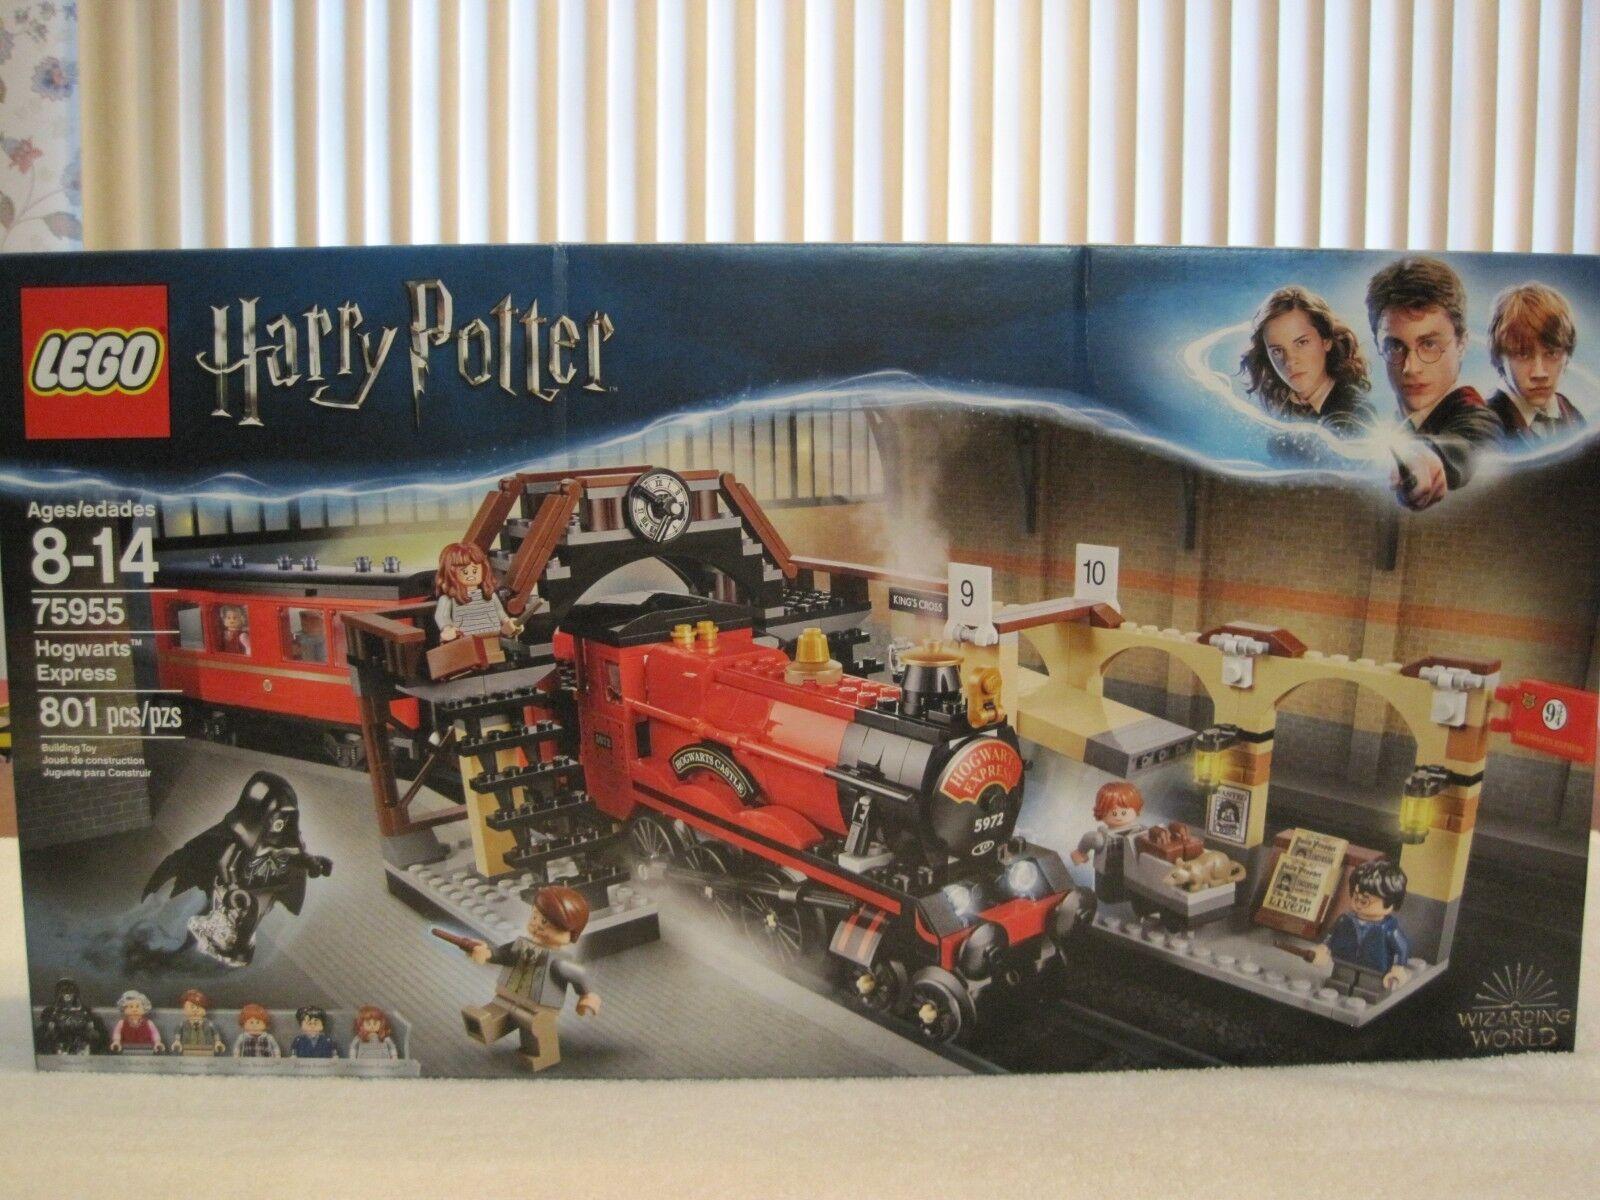 Lego 75955 mundo mágico Harry Potter Hogwarts Express-Nuevo-Sellado De Fábrica